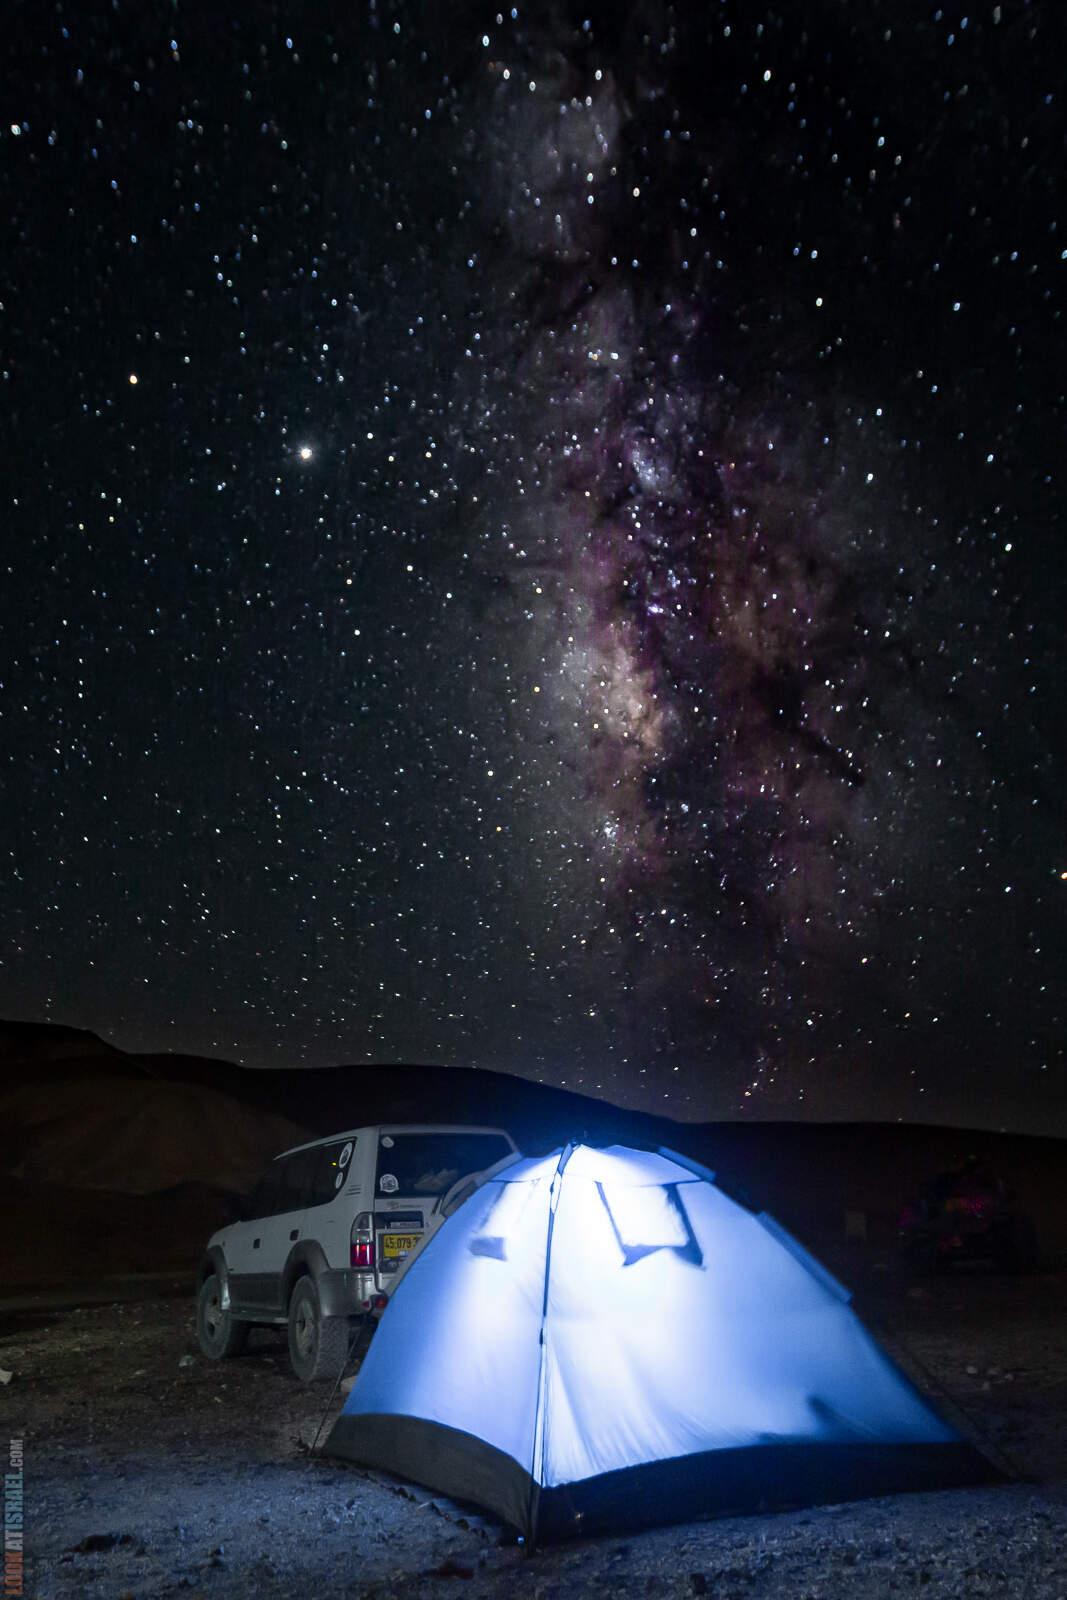 Млечный путь в пустыне, Махтеш Рамон, Израиль | Milky Way in desert, Makhtesh Ramon, Israel | שביל החלב במדבר, מכתש רמון | LookAtIsrael.com - Фото путешествия по Израилю